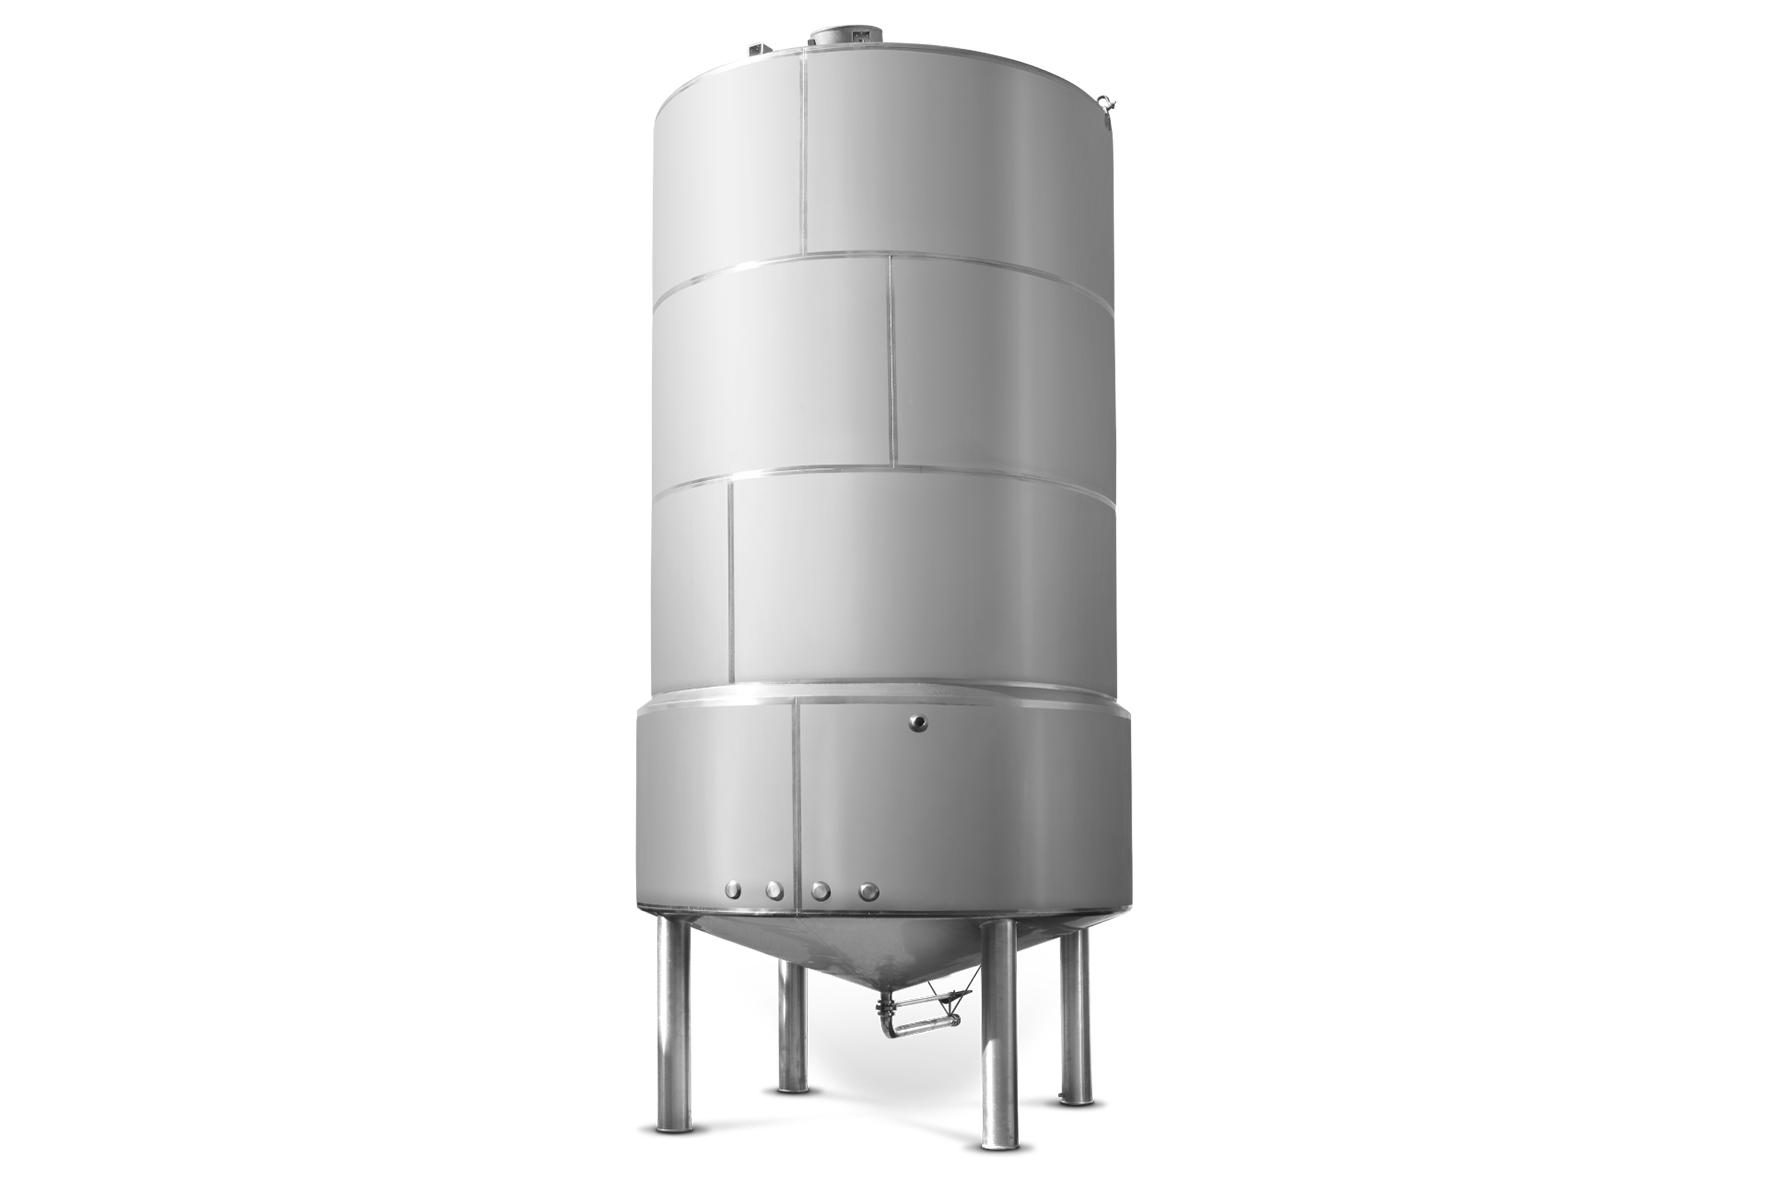 Tanque Vertical - Silo Vertical Inox